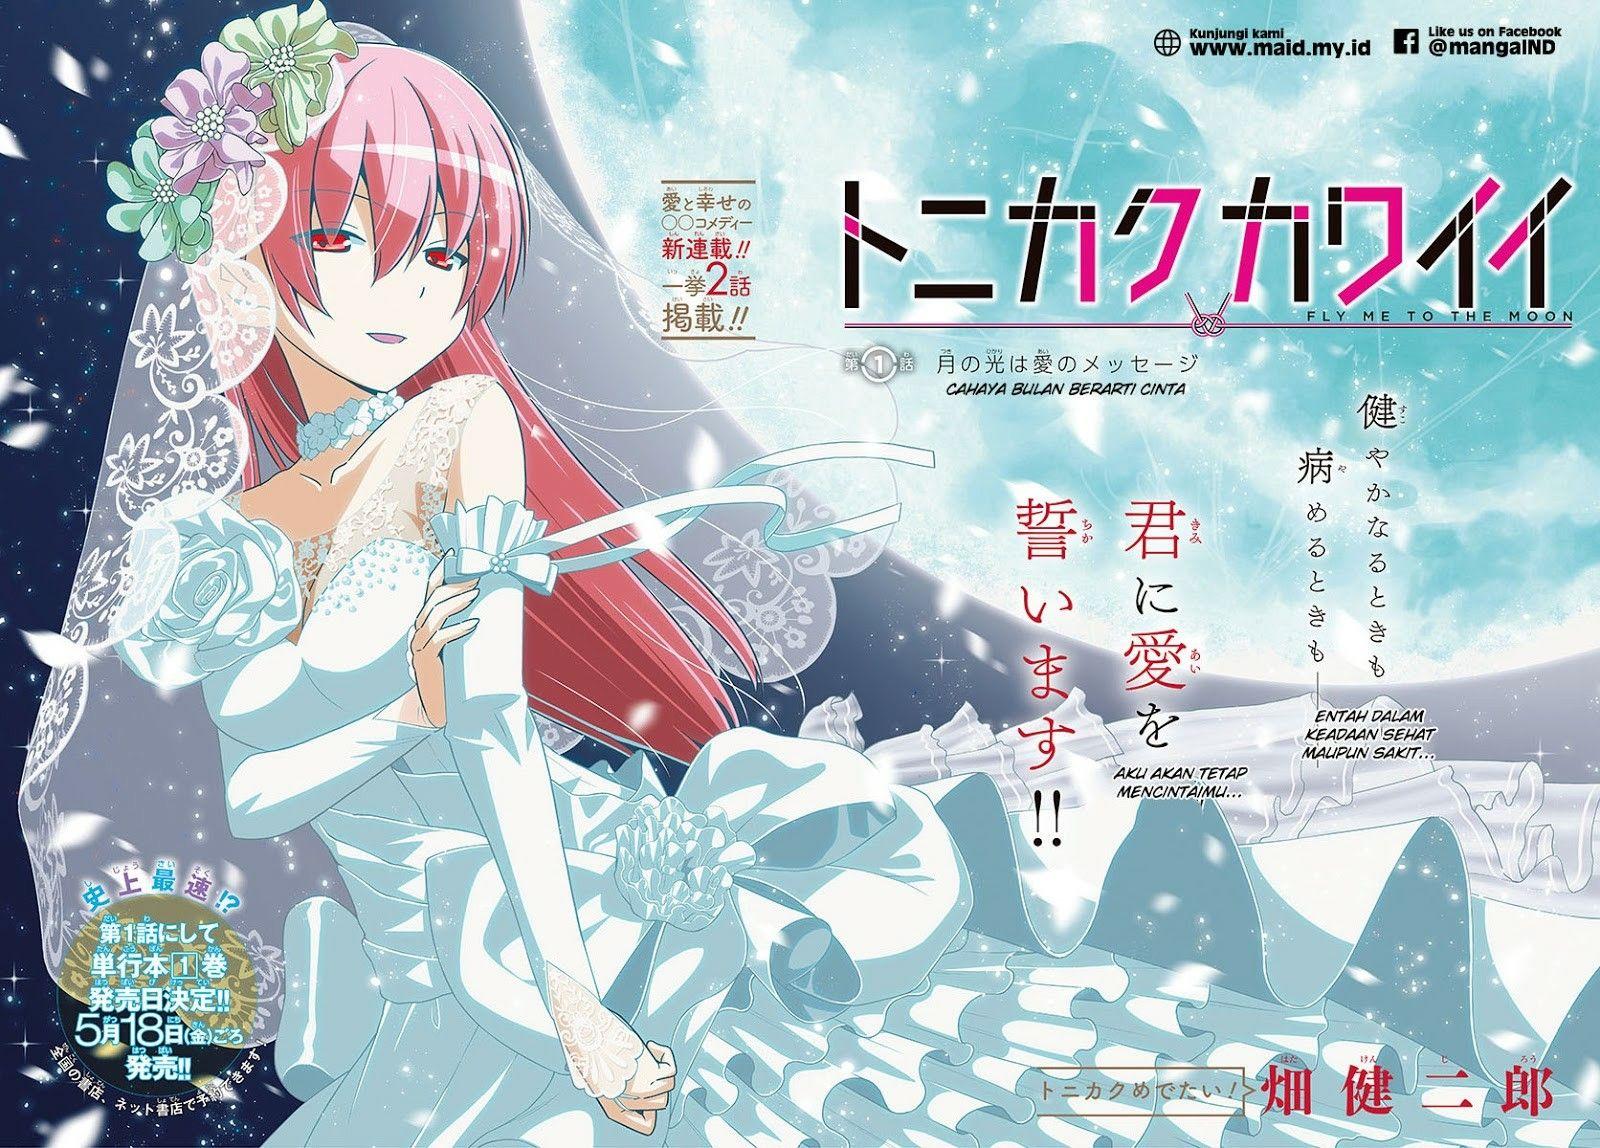 Fly Me To The Moon Anime Tsukasa Wallpaper